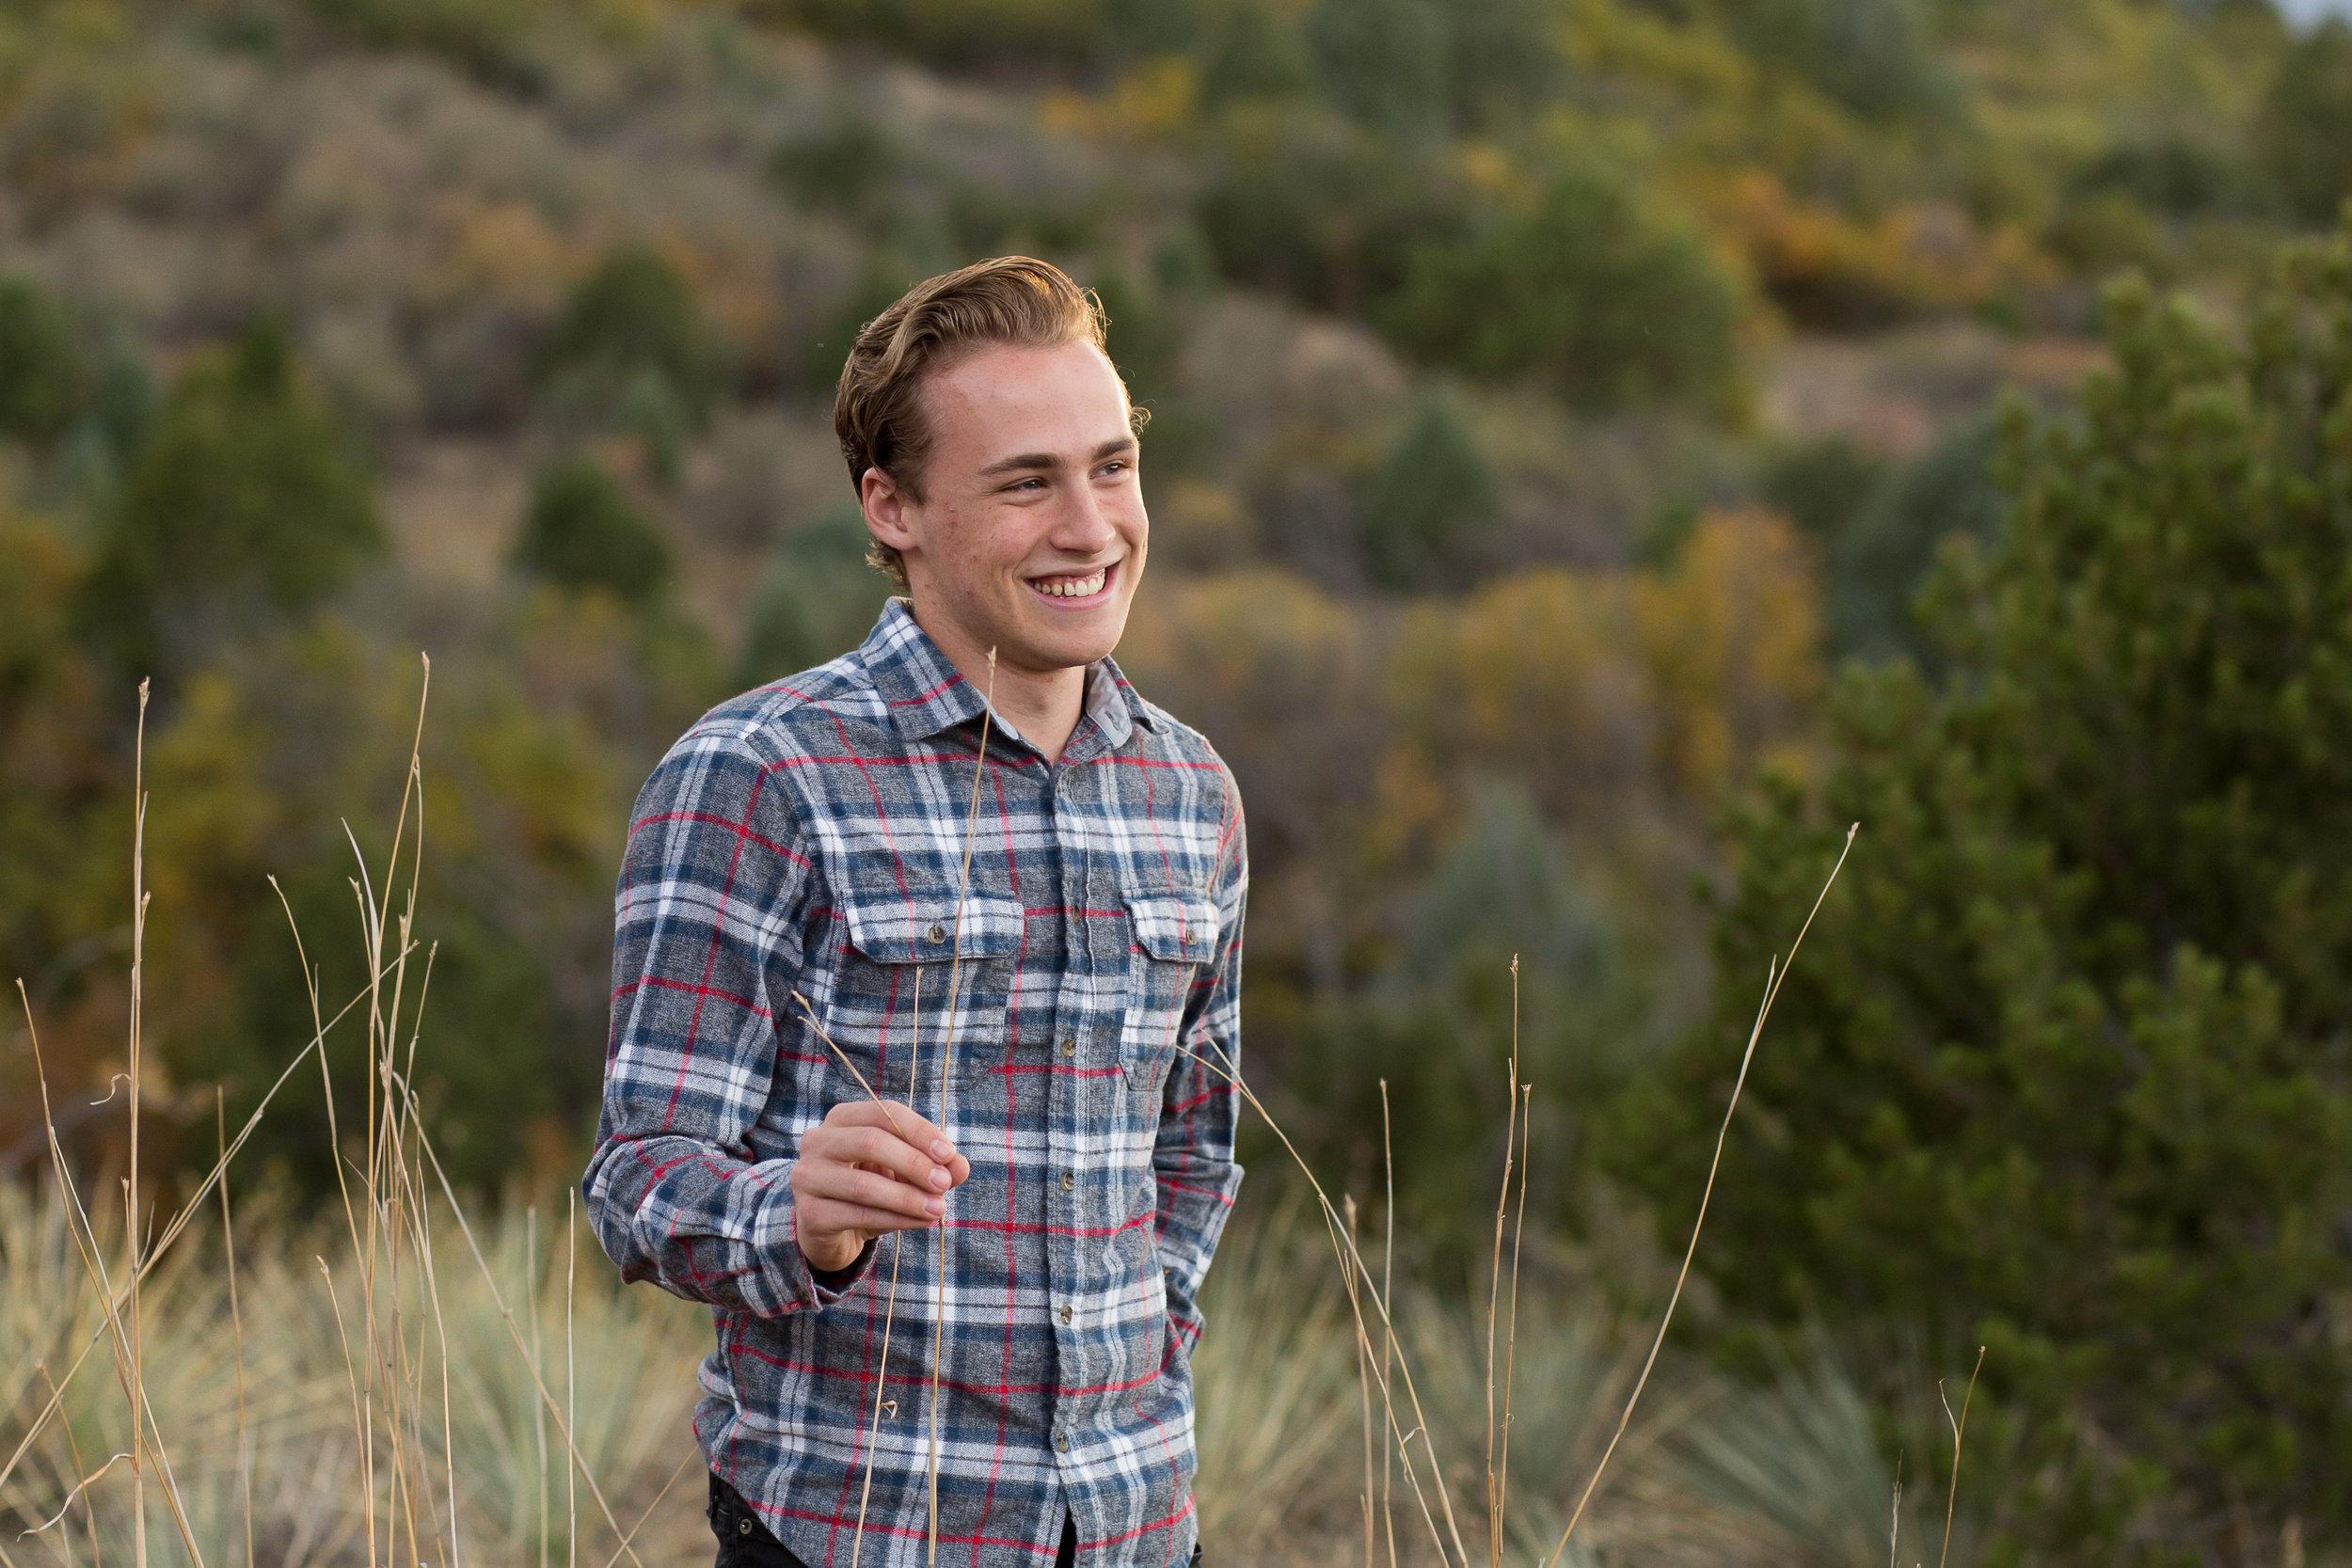 Senior boy from Palmer High School standing in field | Colorado Springs Senior Photography | Colorado Springs Senior Photographer | Stacy Carosa Photography | Colorado Senior Portraits | Doherty High School